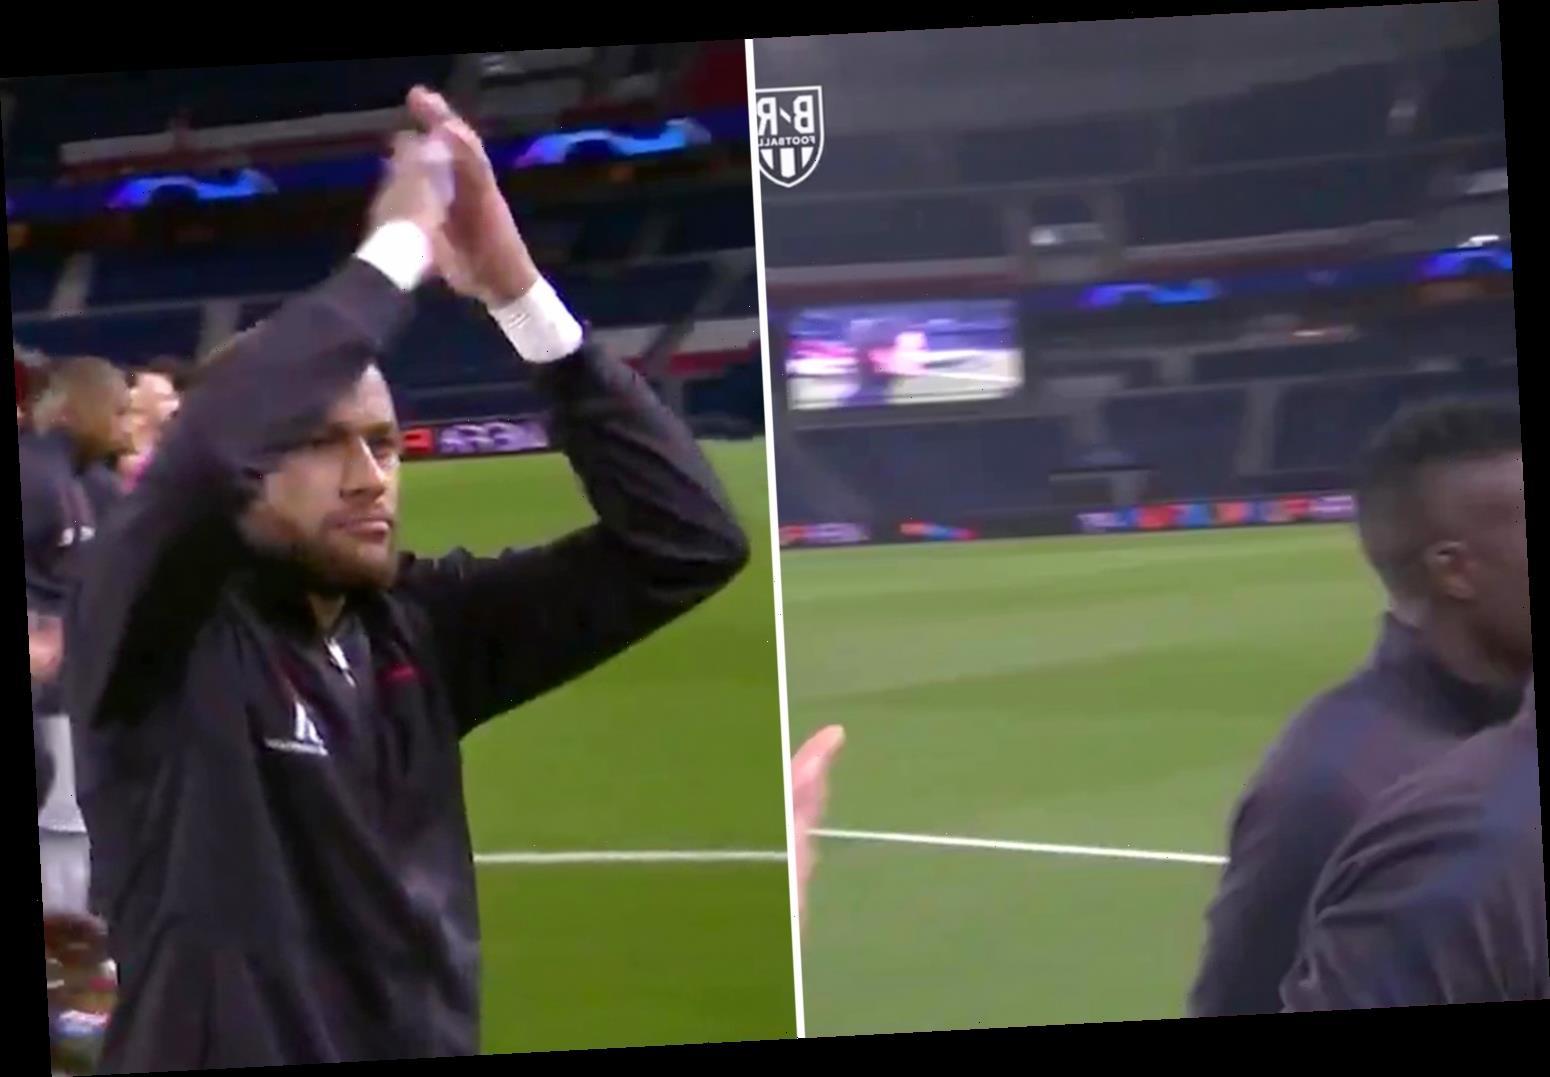 Neymar applauds empty stadium as PSG try to overturn Borussia Dortmund deficit behind closed doors – The Sun